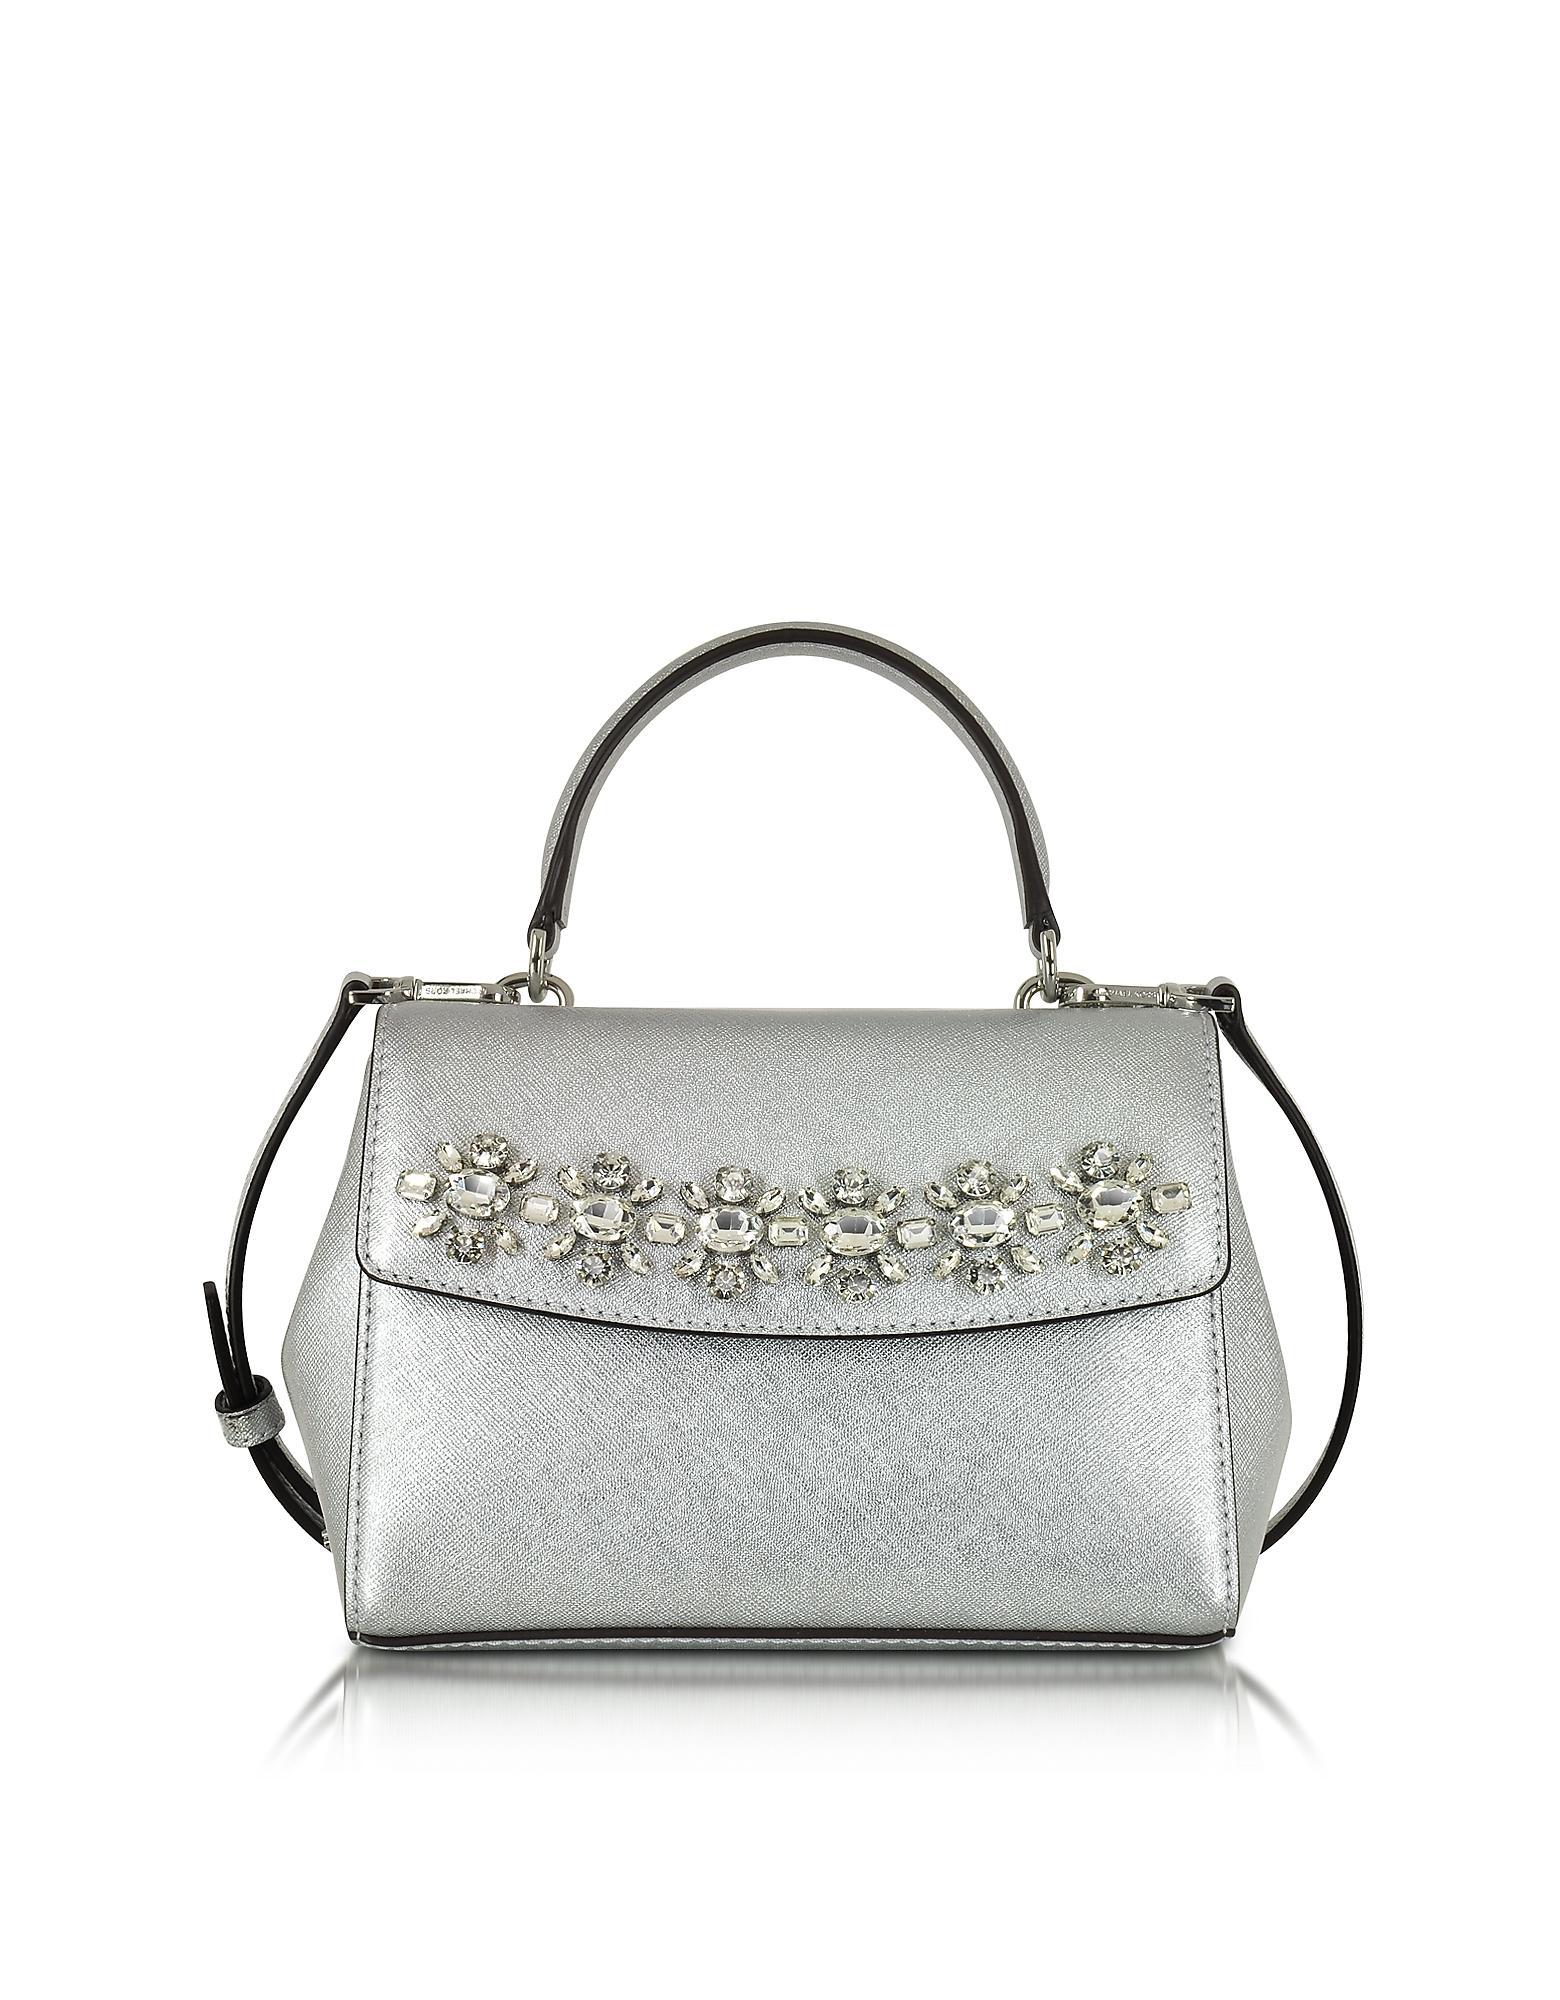 a5230e9885fe Lyst - Michael Kors Ava Jewelry Xs Metallic Saffiano Leather ...